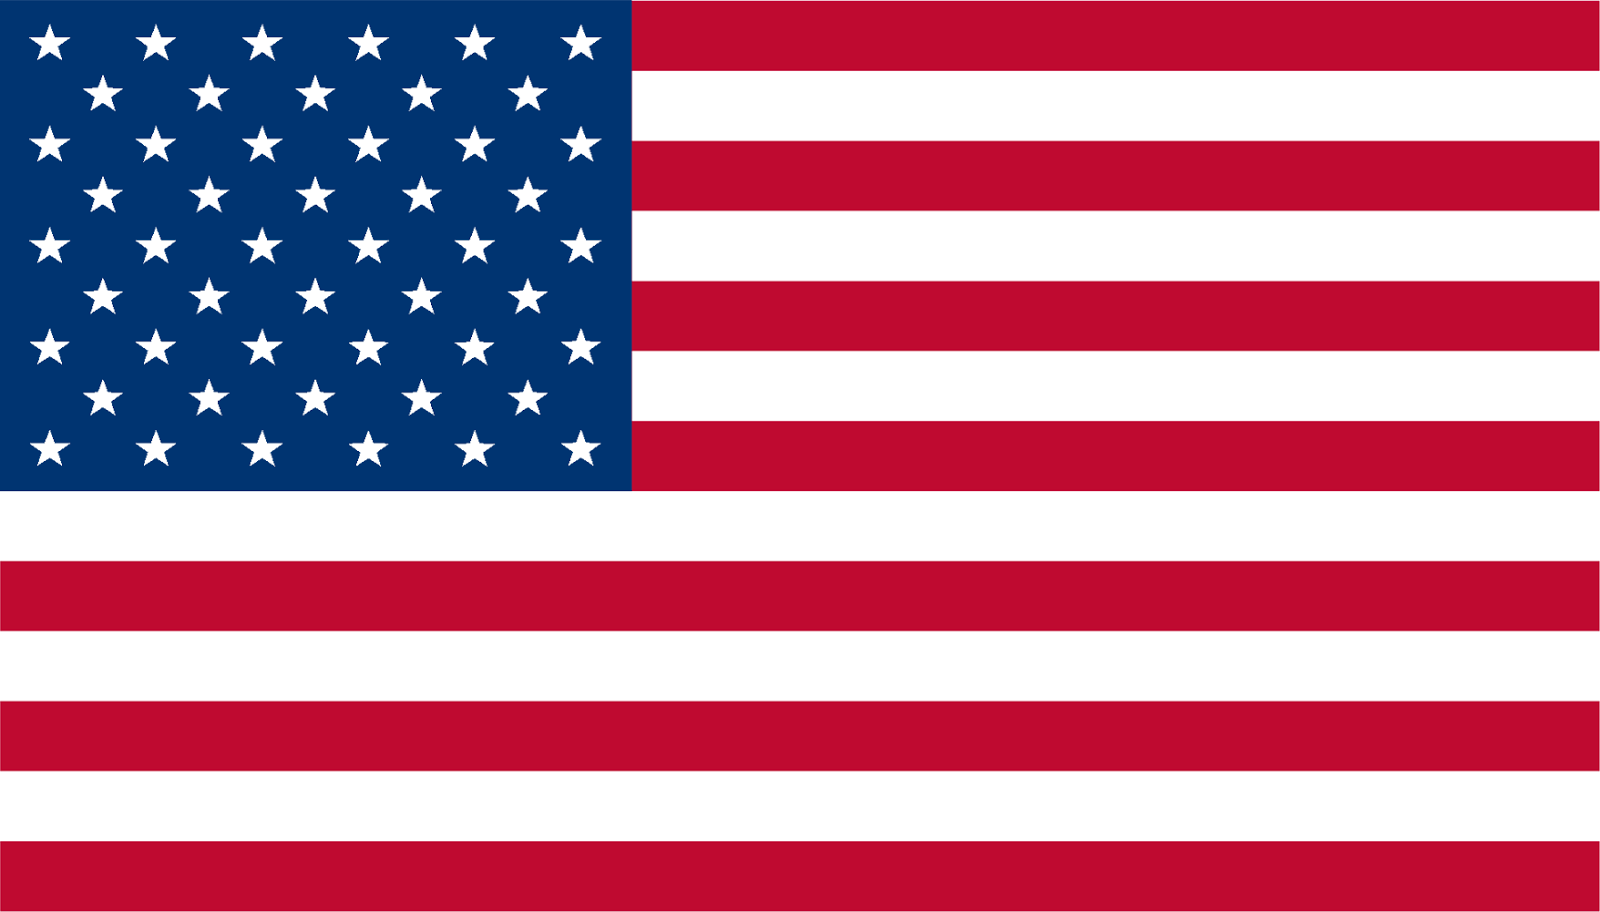 usa national flag foto bugil 2017 On the flag is